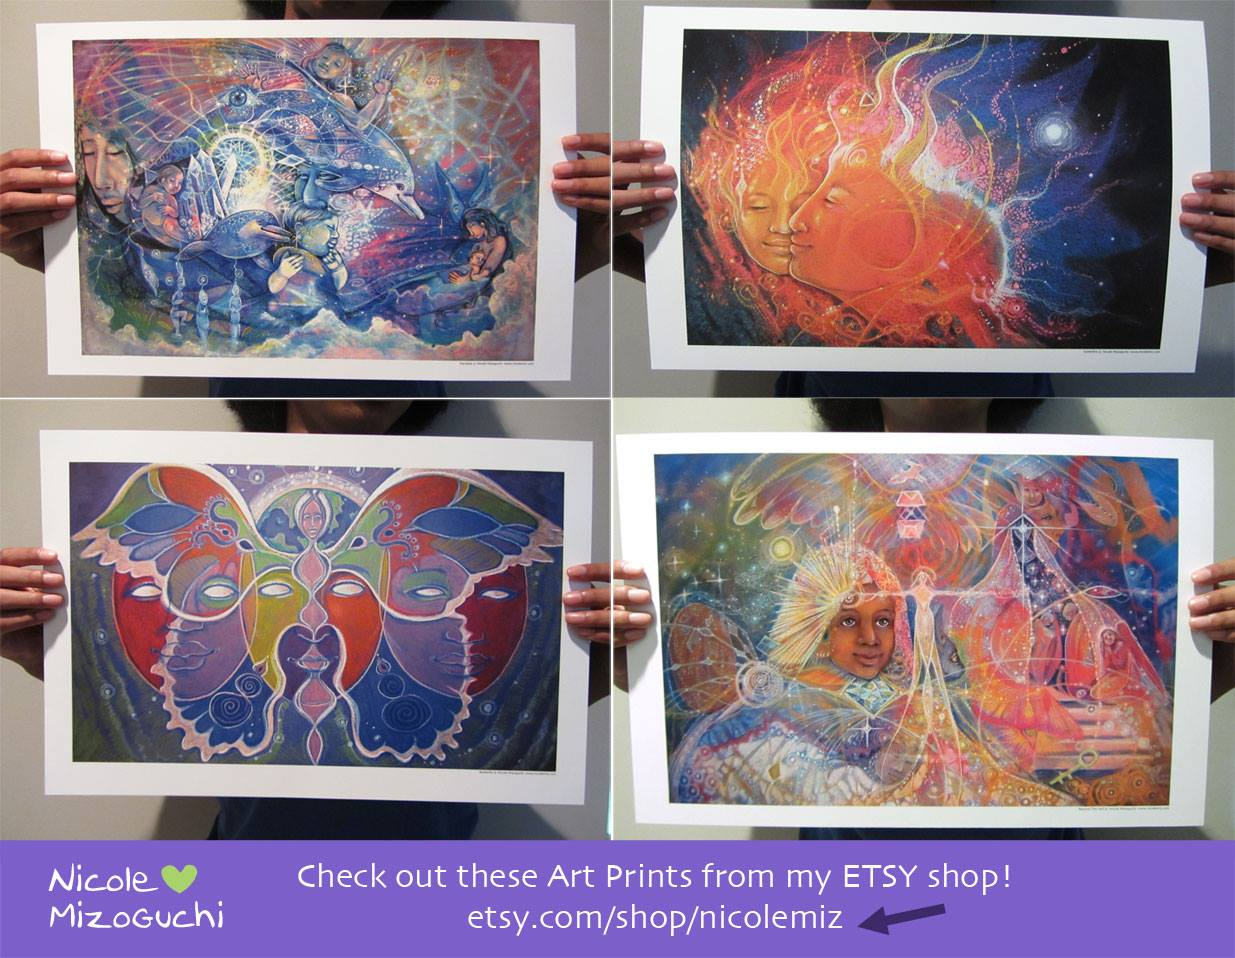 nicole mizoguchi art prints on etsy shop